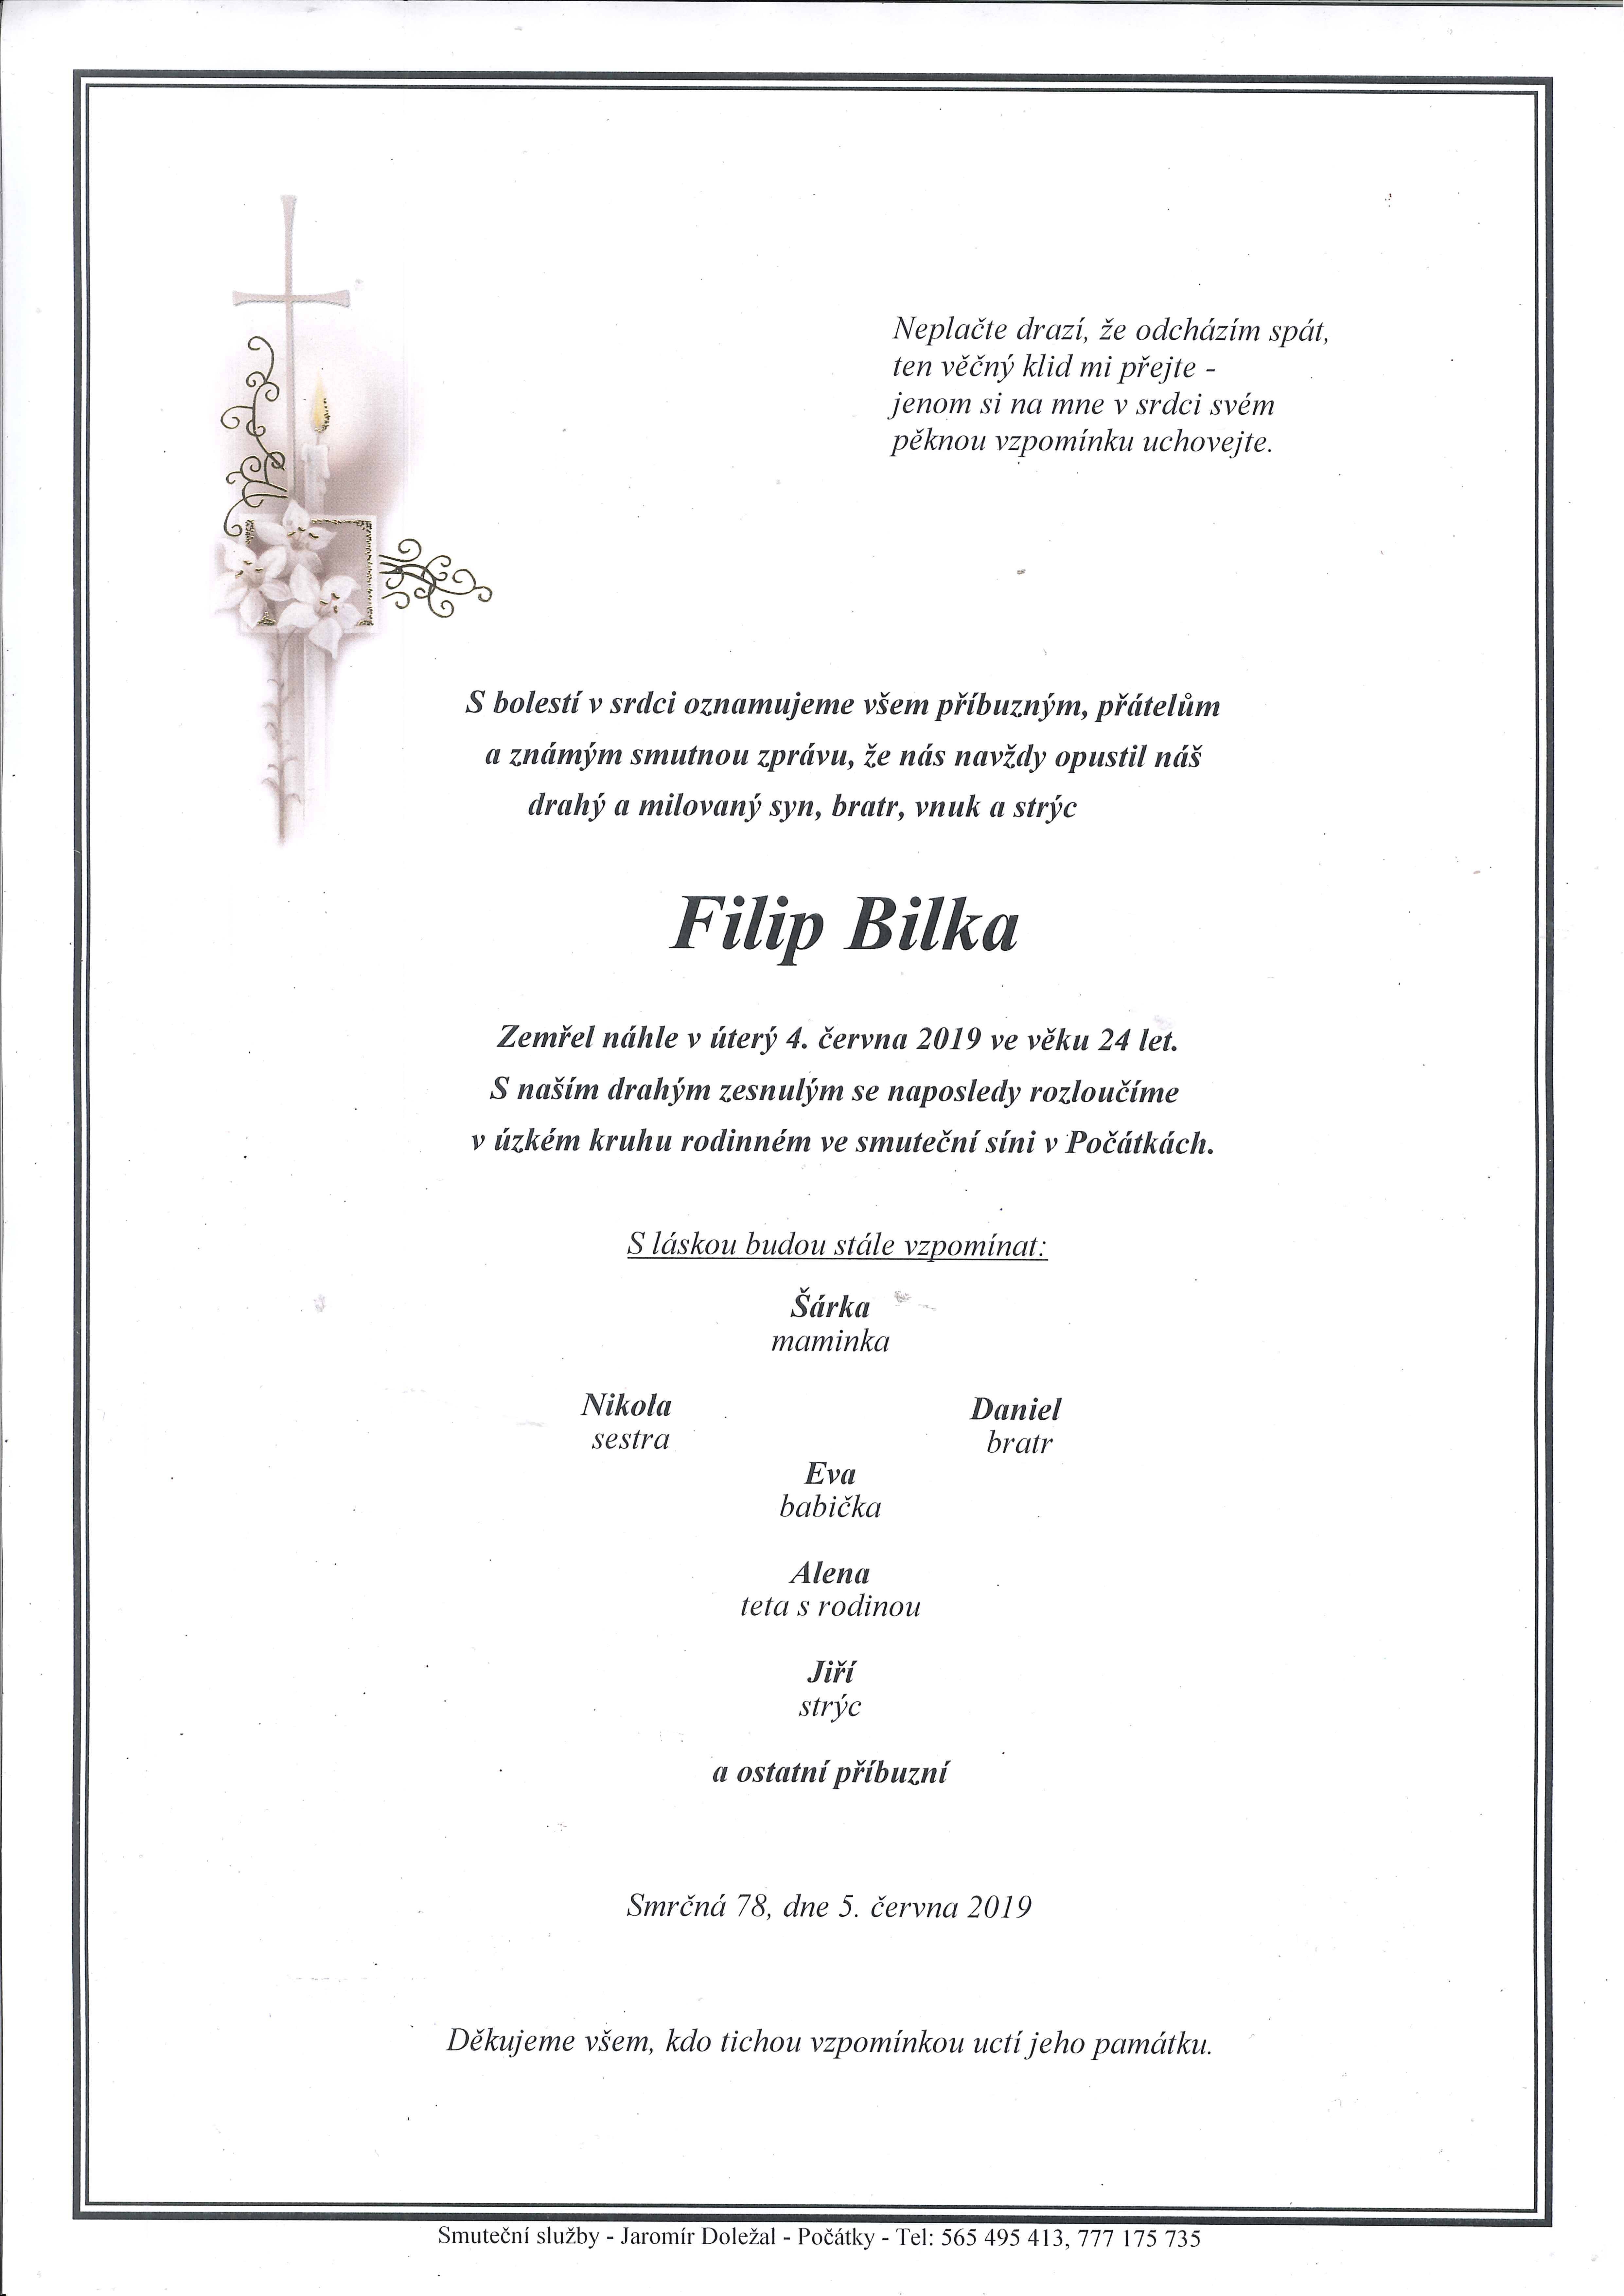 Filip Bilka